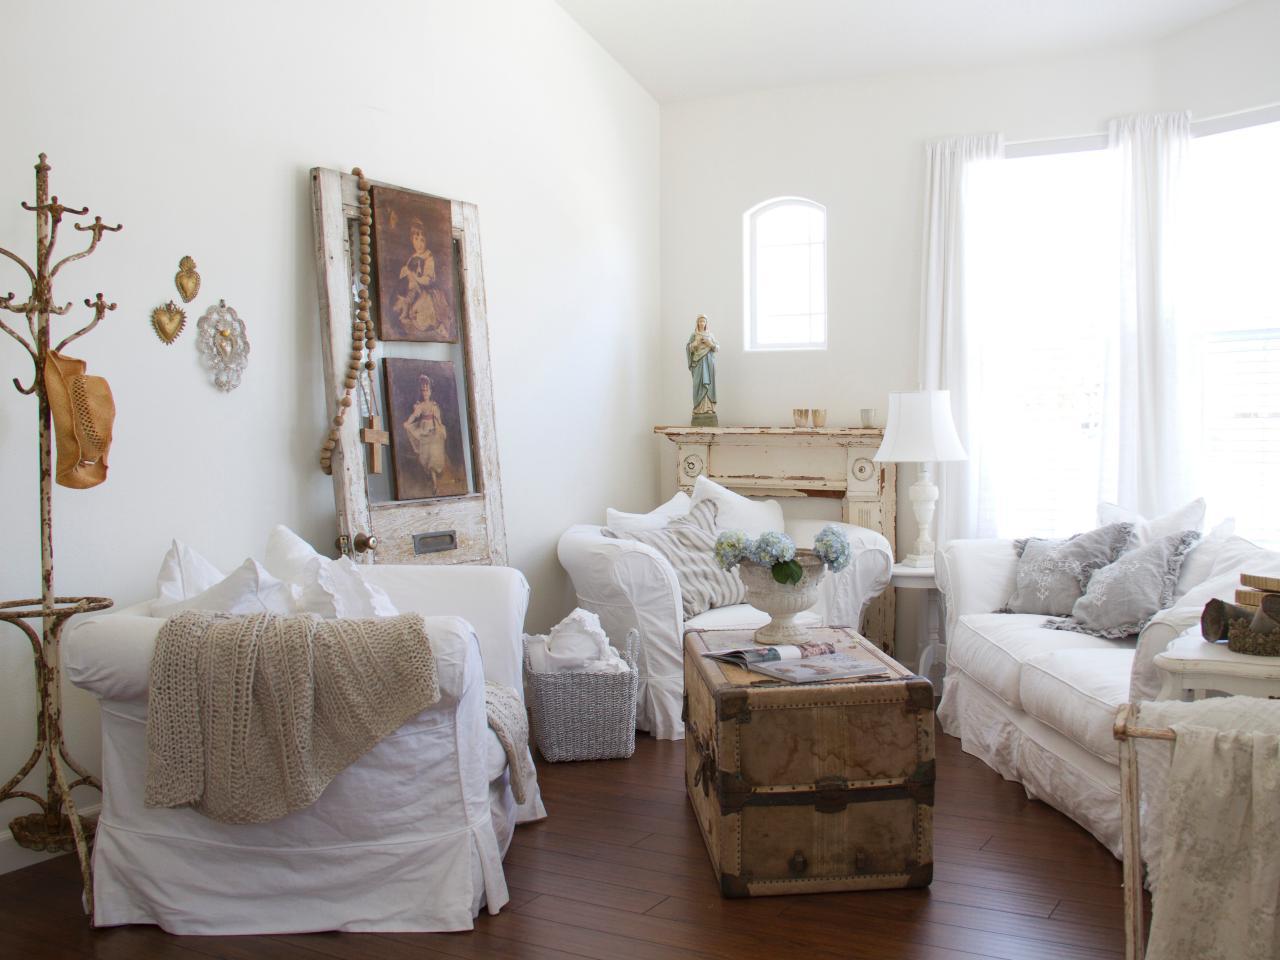 Original_Dustylu-Interiors-full-living-room-shot-shabby-chic_s4x3.jpg.rend.hgtvcom.1280.960